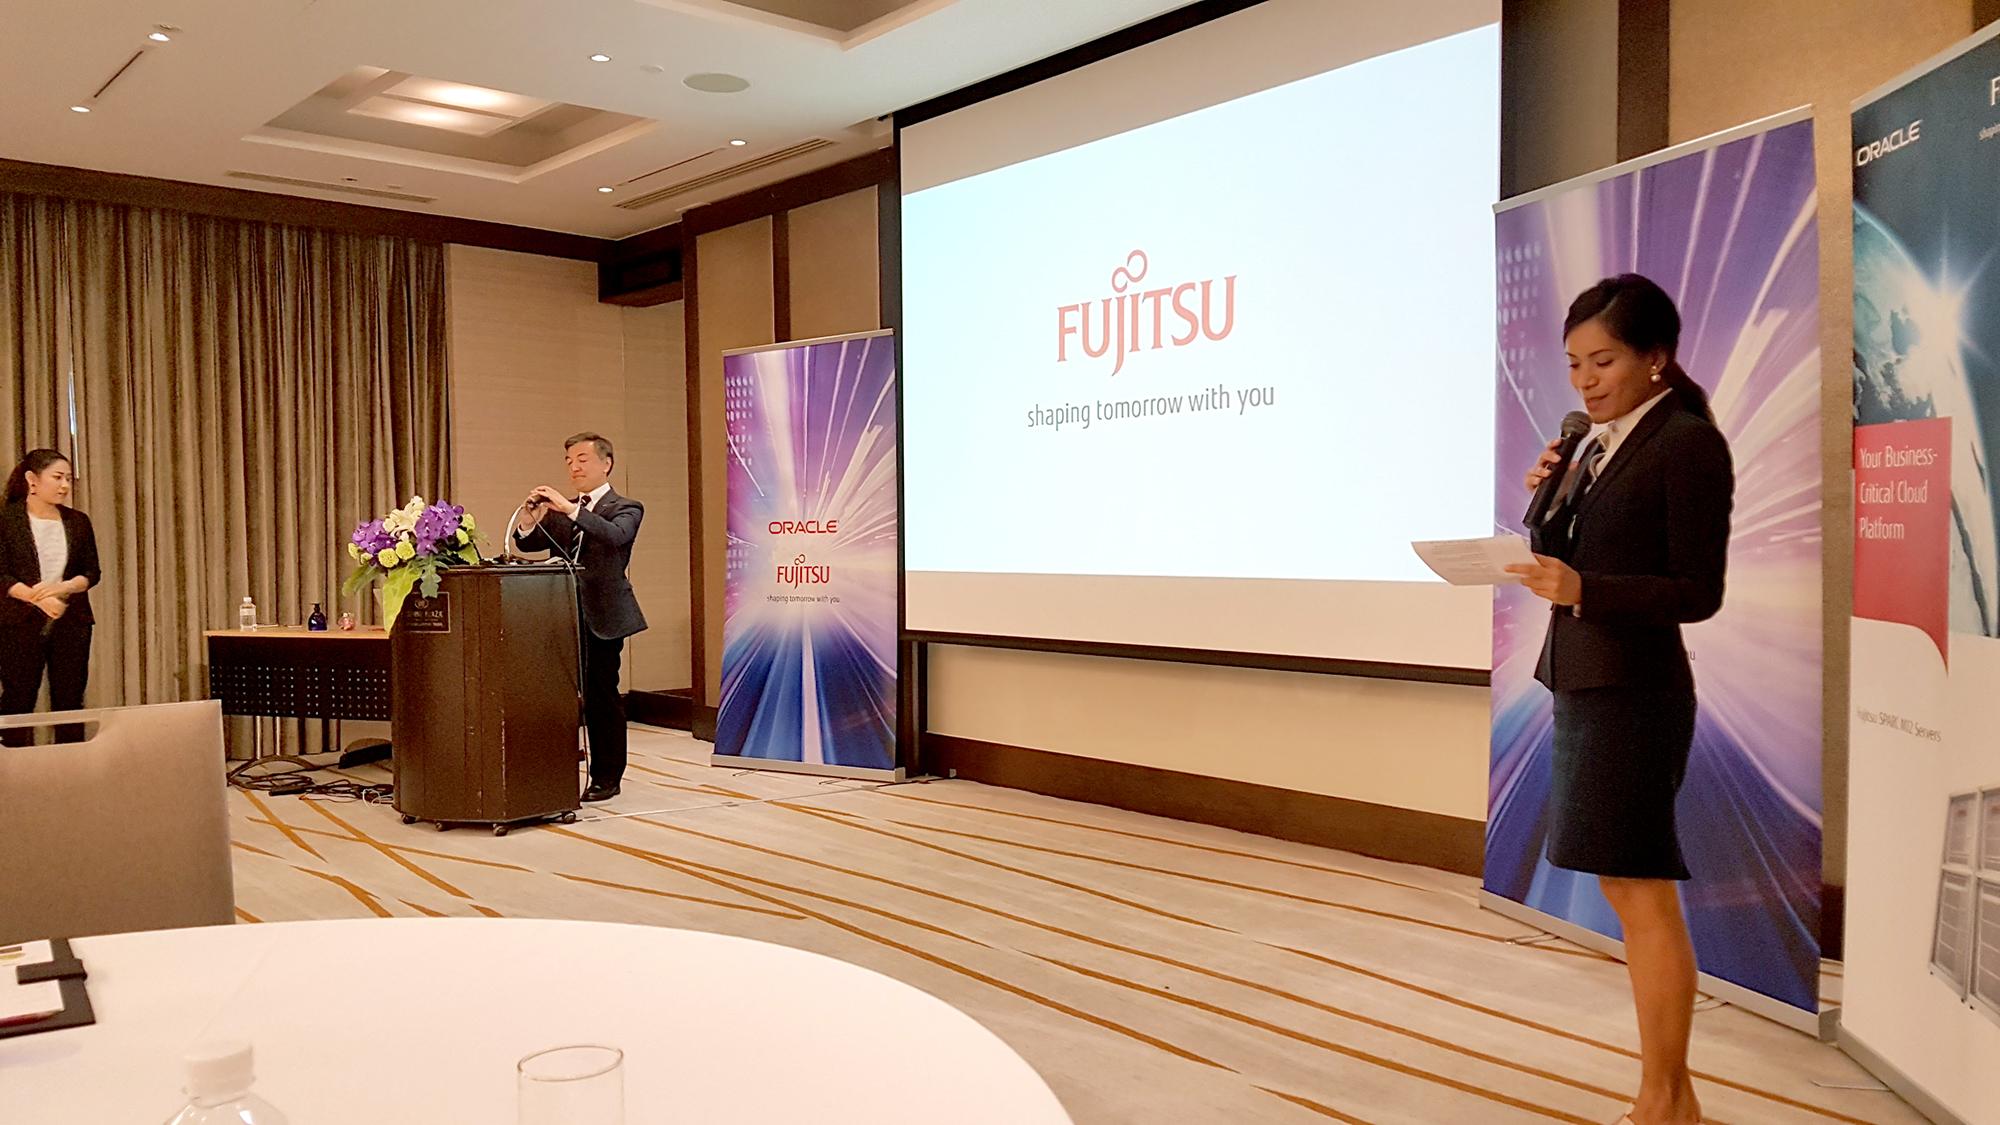 ORACLE • FUJITSU Seminar BKK 2017